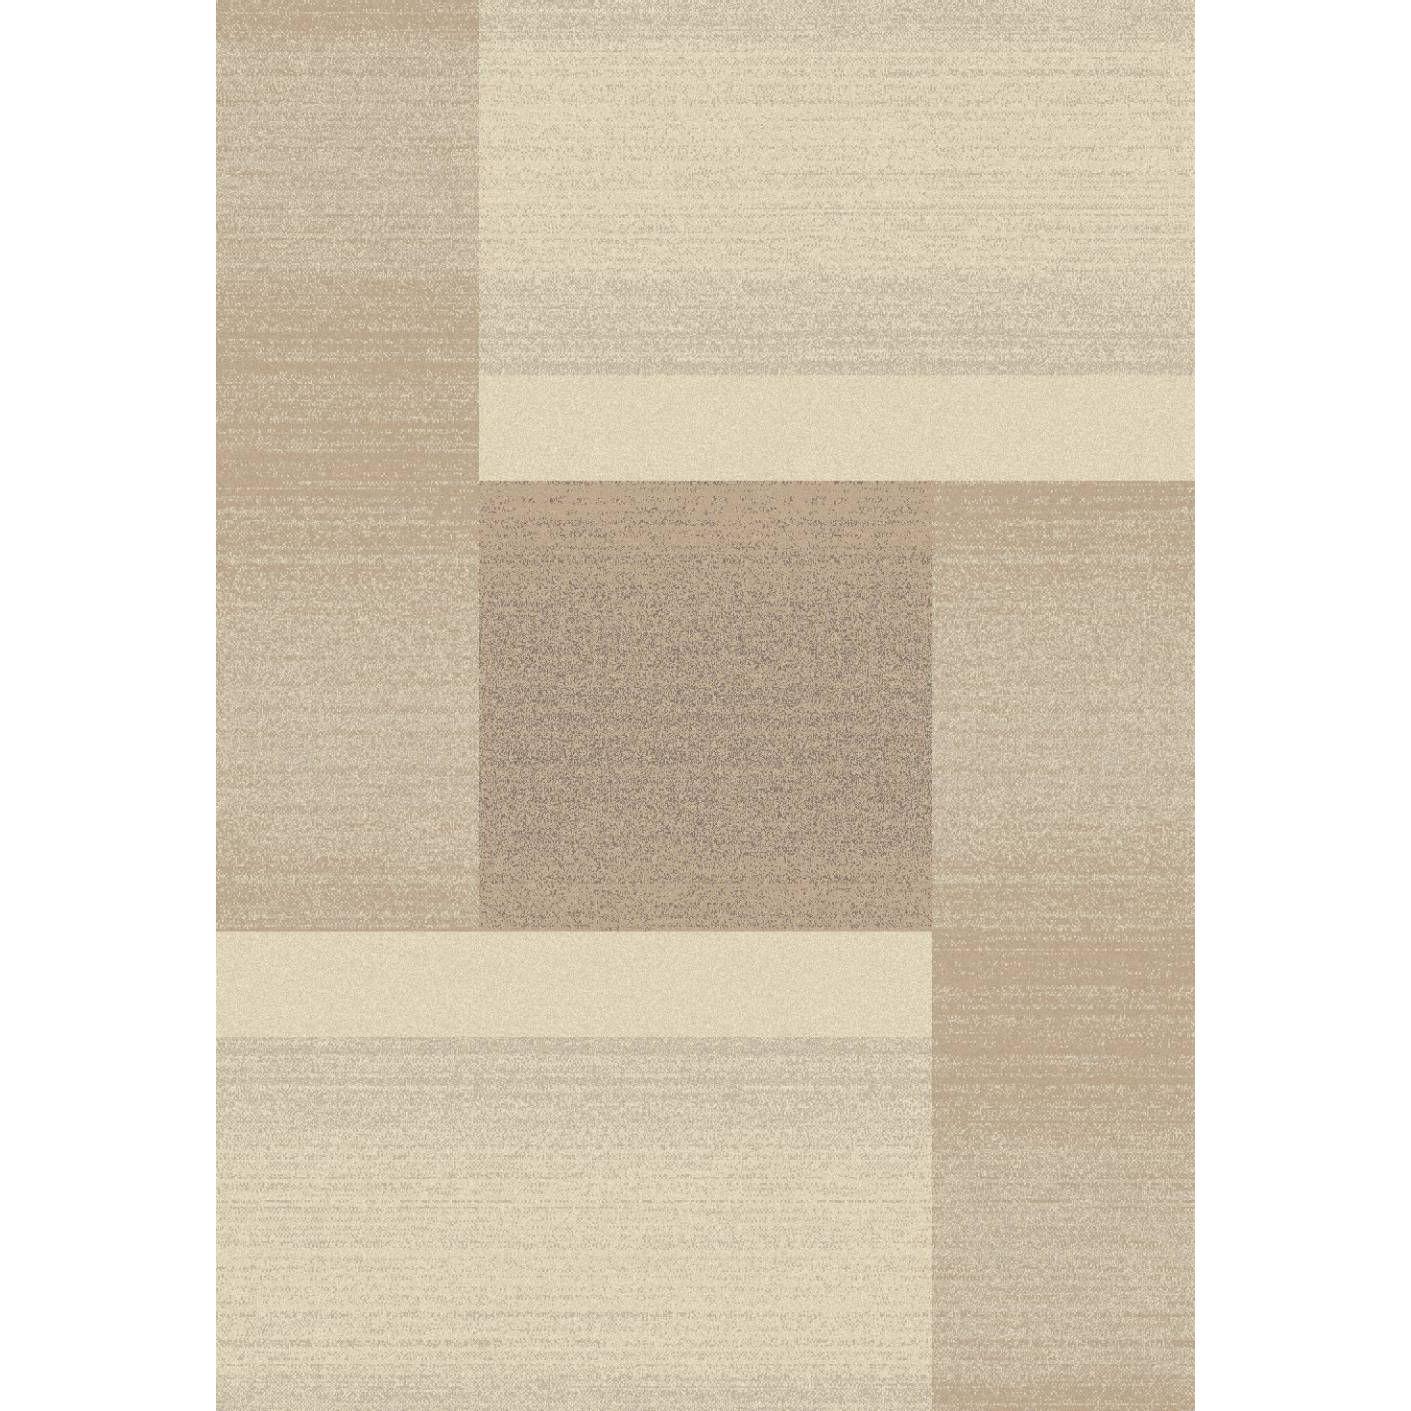 modern carpet carpet concept flow modern beige rug - 2813-8002 UJIDLFB